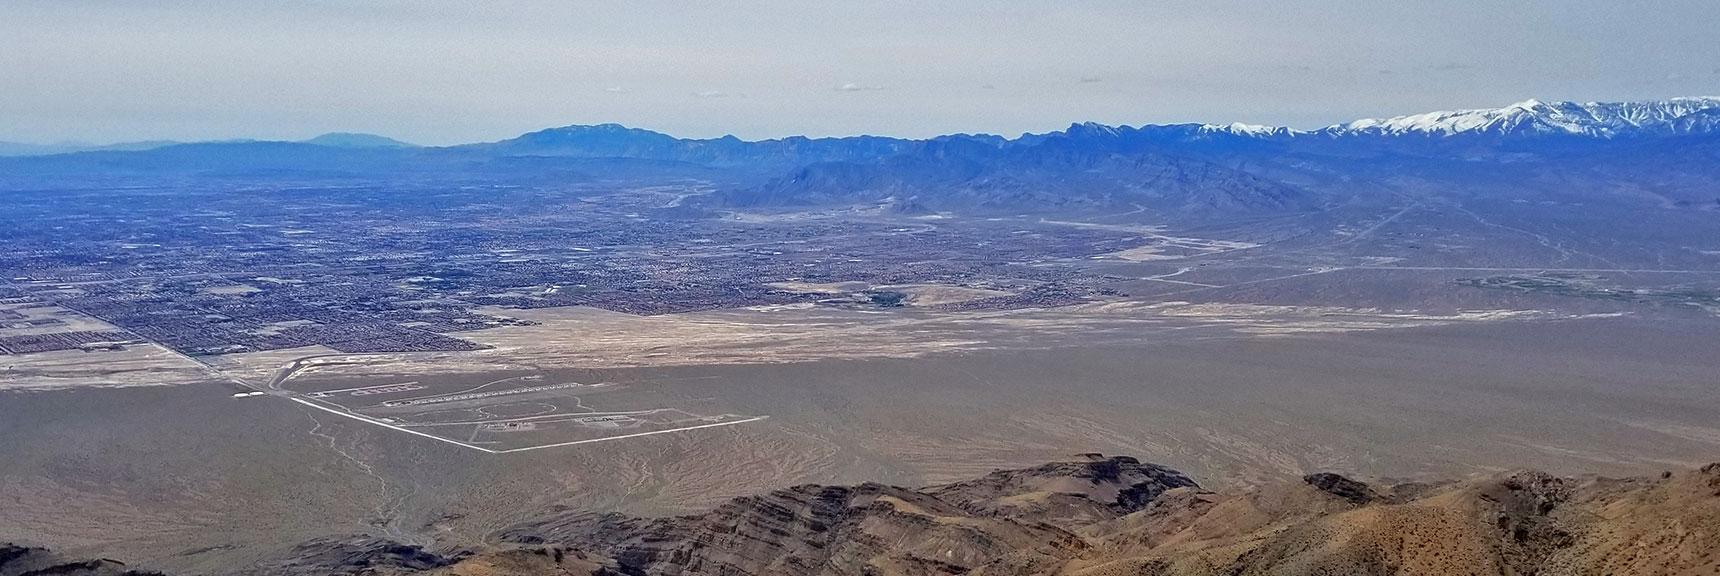 View of Northwestern Las Vegas from Near the Gass Peak Eastern Summit | Gass Peak Eastern Summit Ultra-marathon Adventure, Nevada